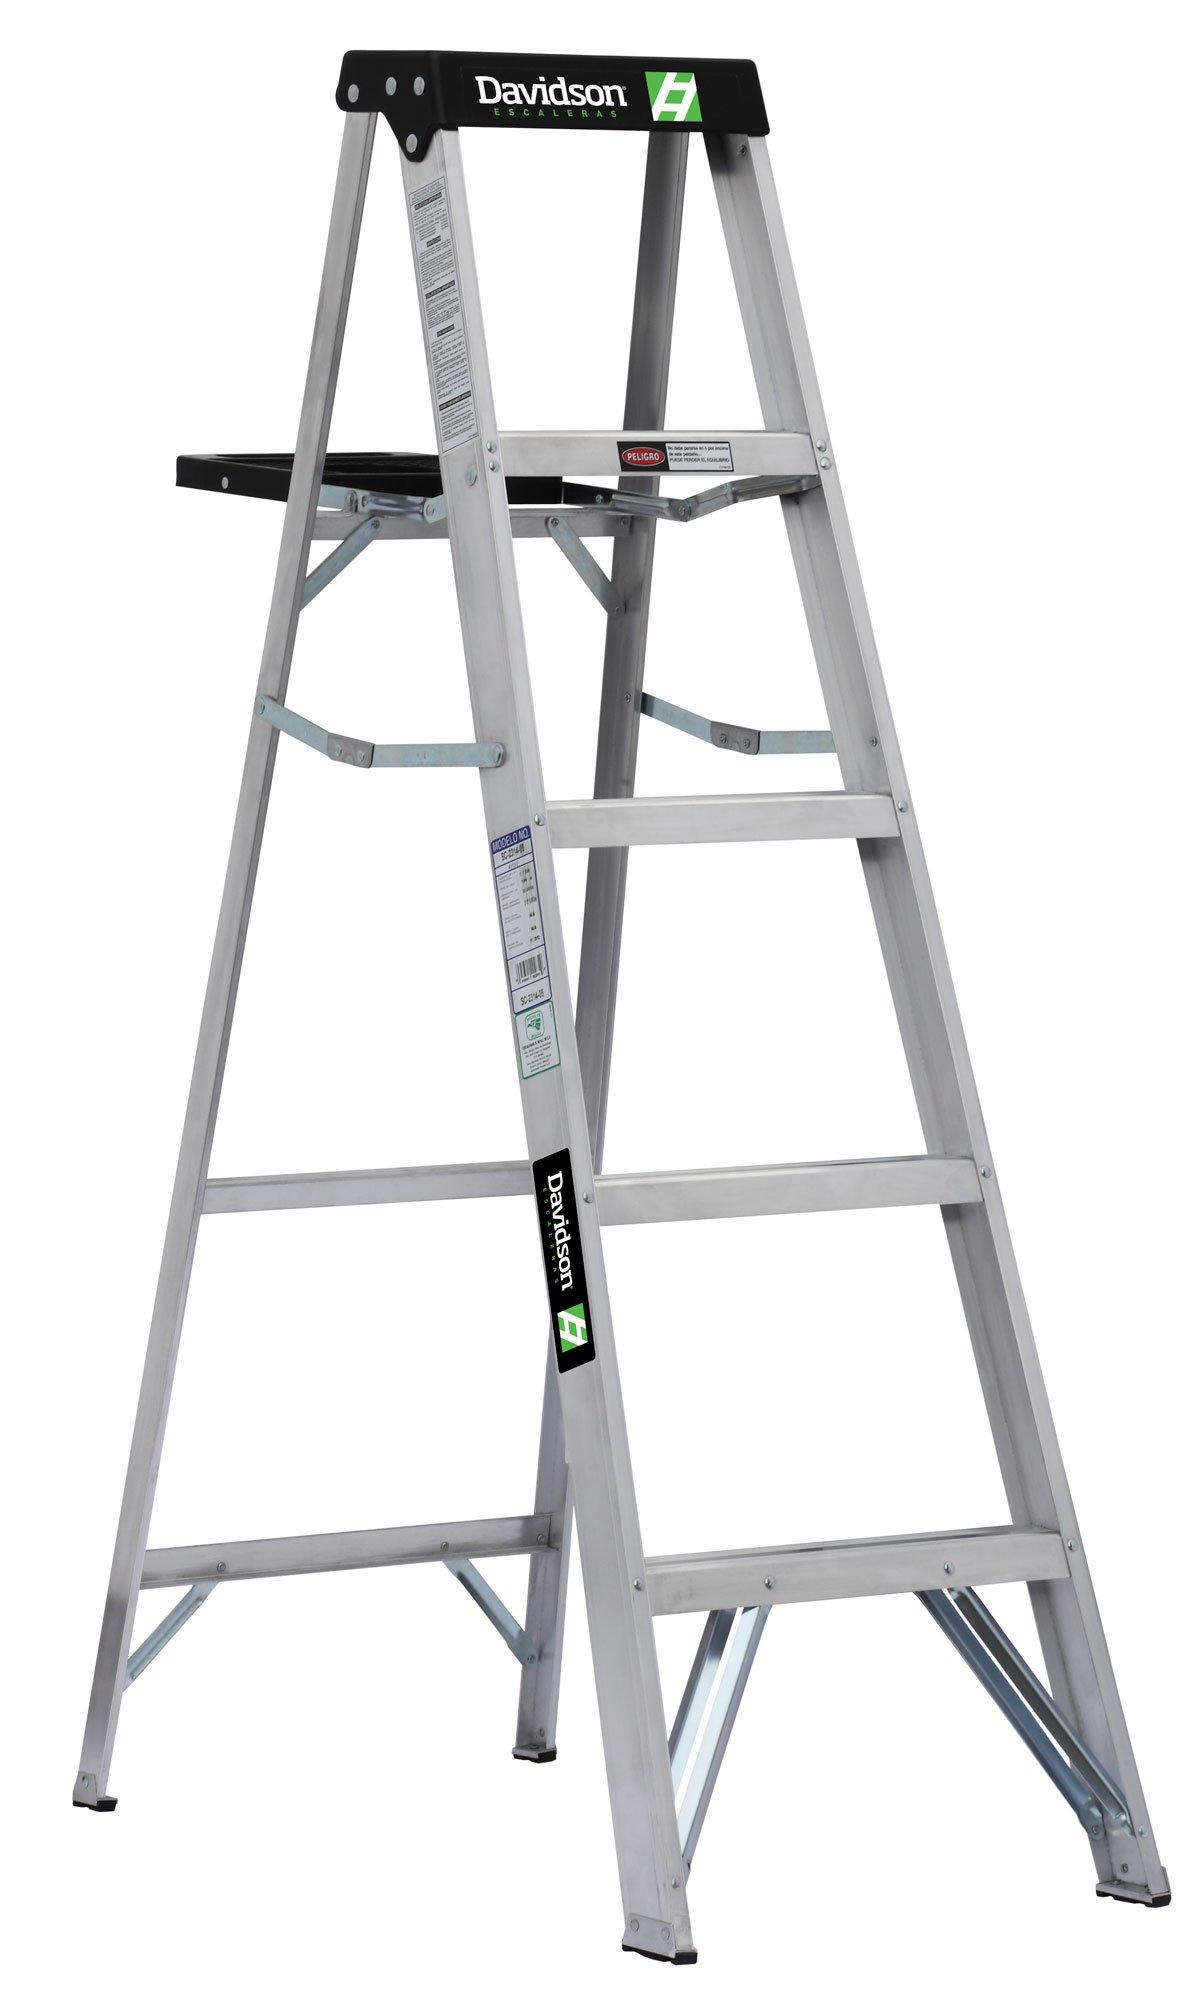 Escalera de tijera con 4 escalones sears com mx me for Escaleras tijera